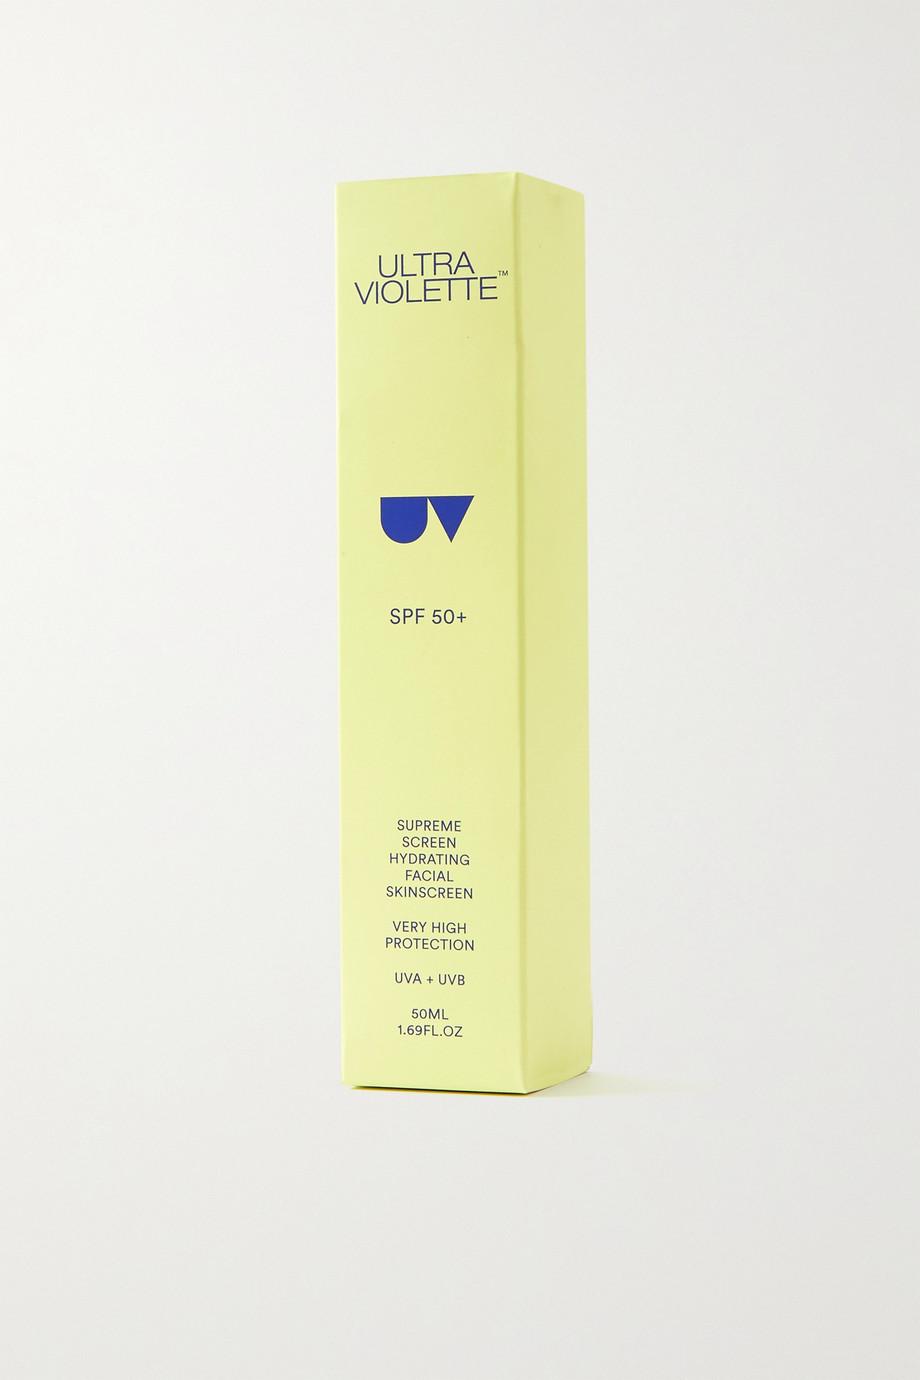 Ultra Violette Supreme Screen Hydrating Facial Skinscreen LSF 50+, 50 ml – Sonnencreme